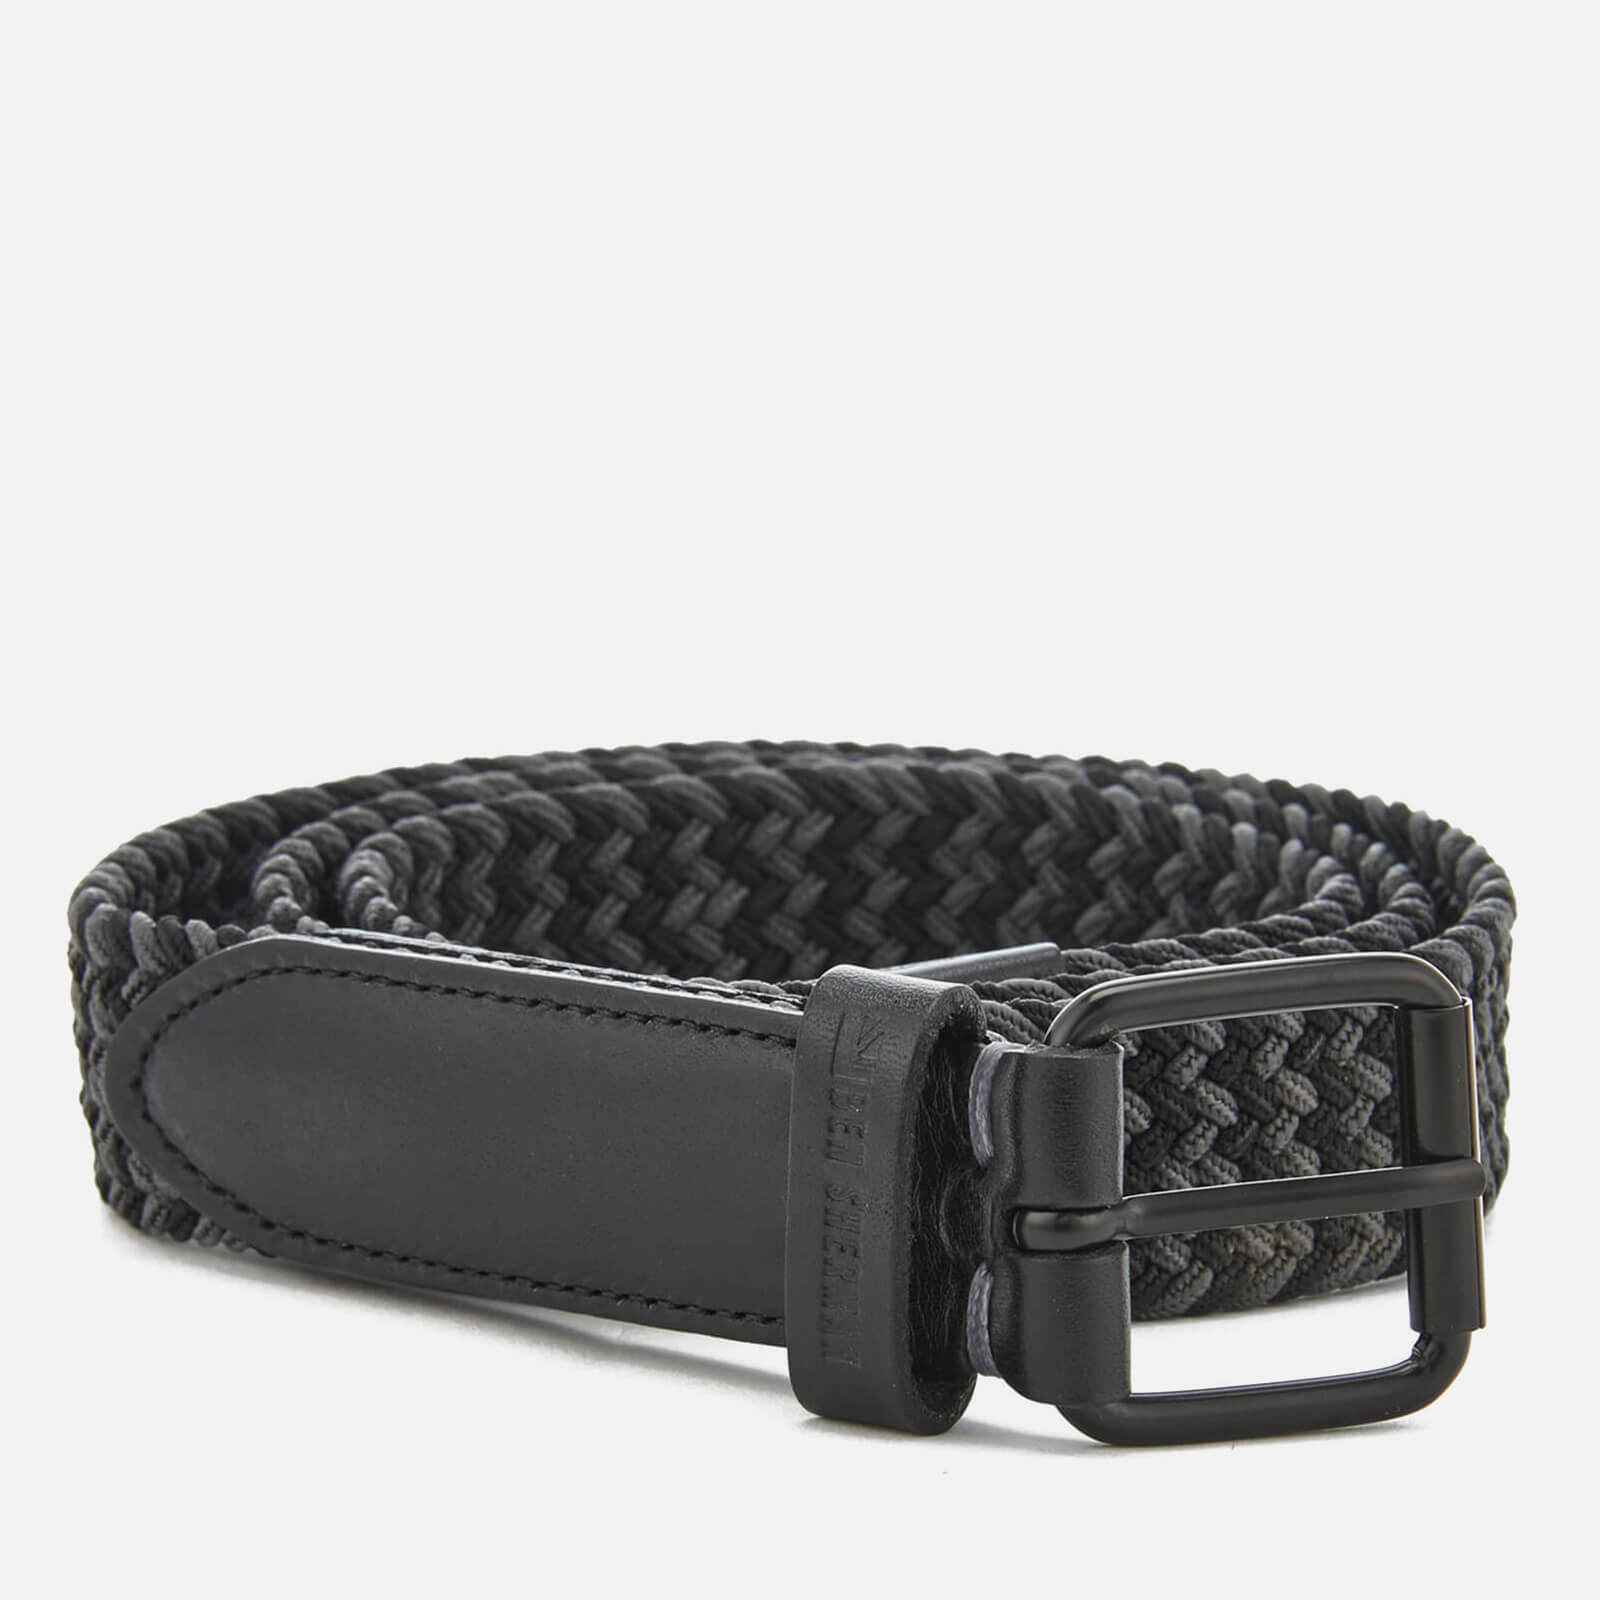 42dacb721e0f Ben Sherman Men's Barbican Plaited Belt - Black/Grey Mens ...